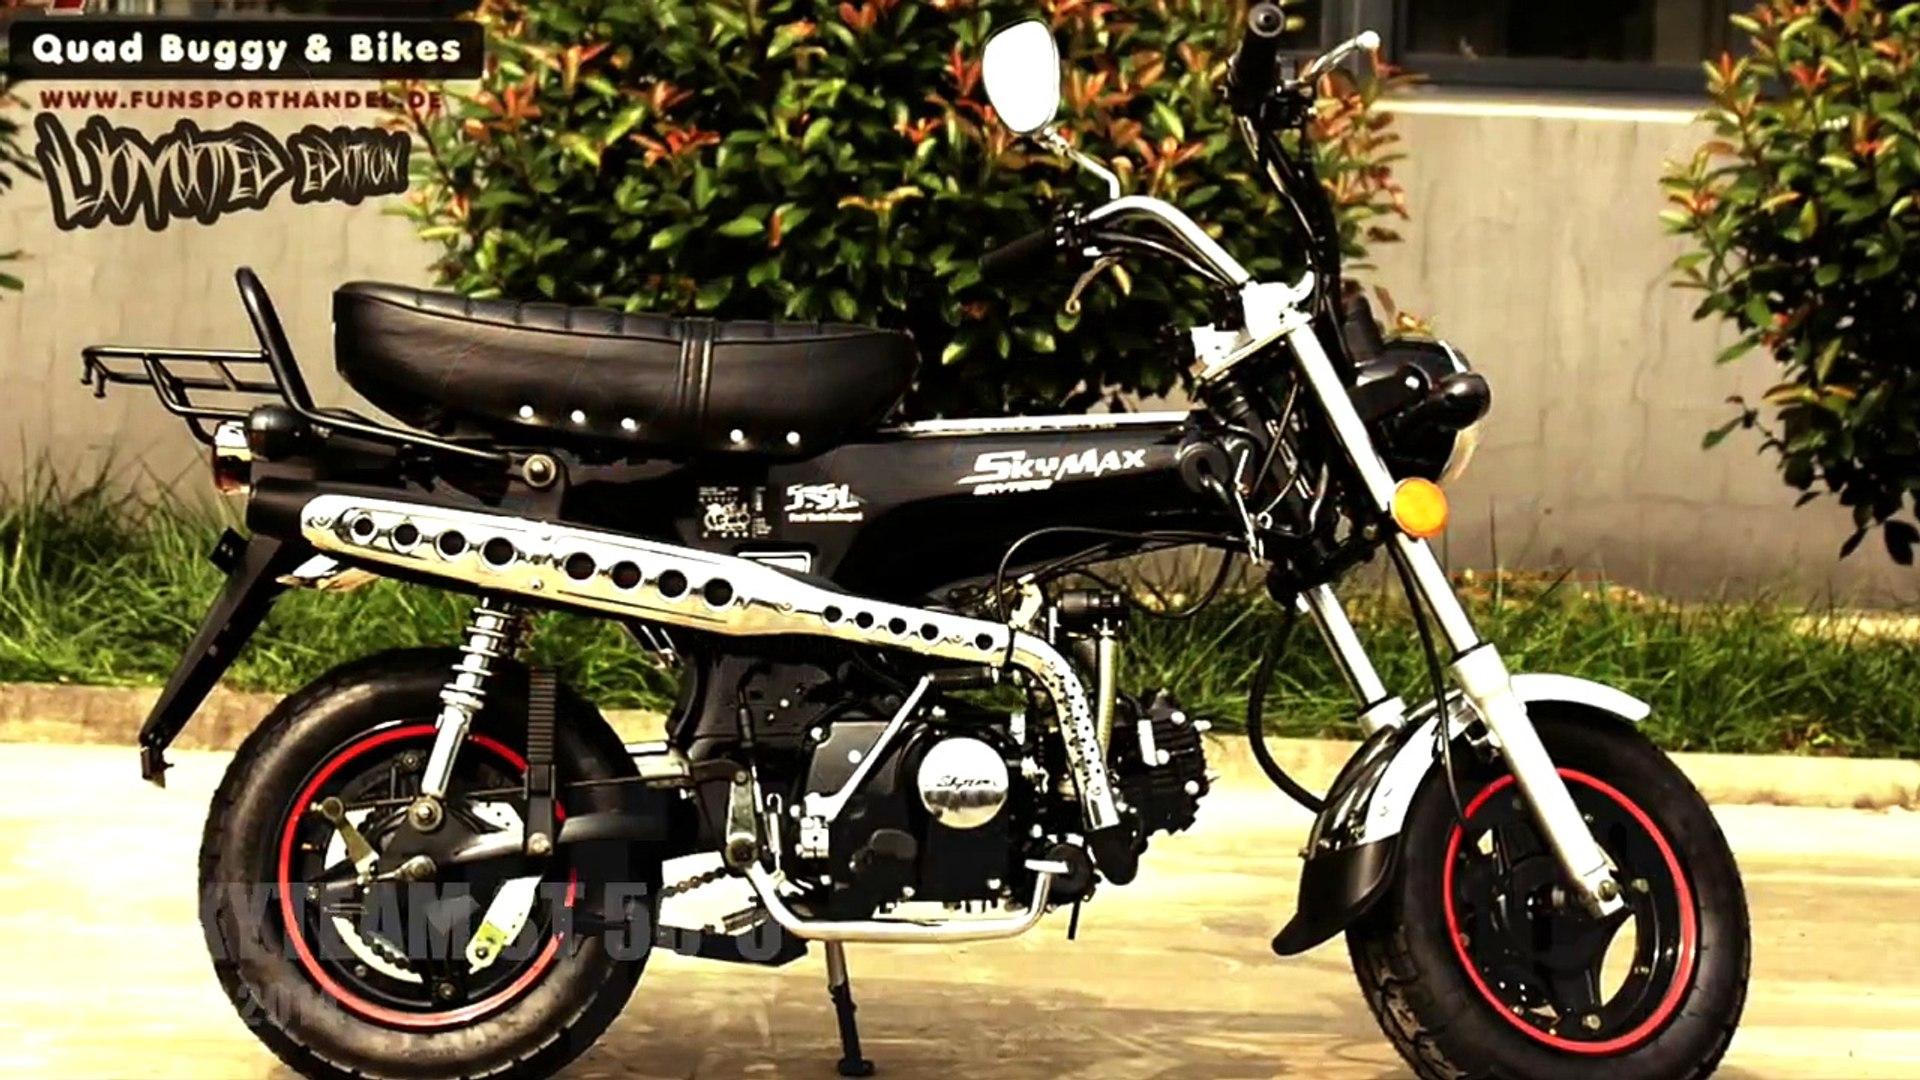 Skyteam ST50-6 - Honda Dax Nachbau 50ccm Moped - NEU 2014